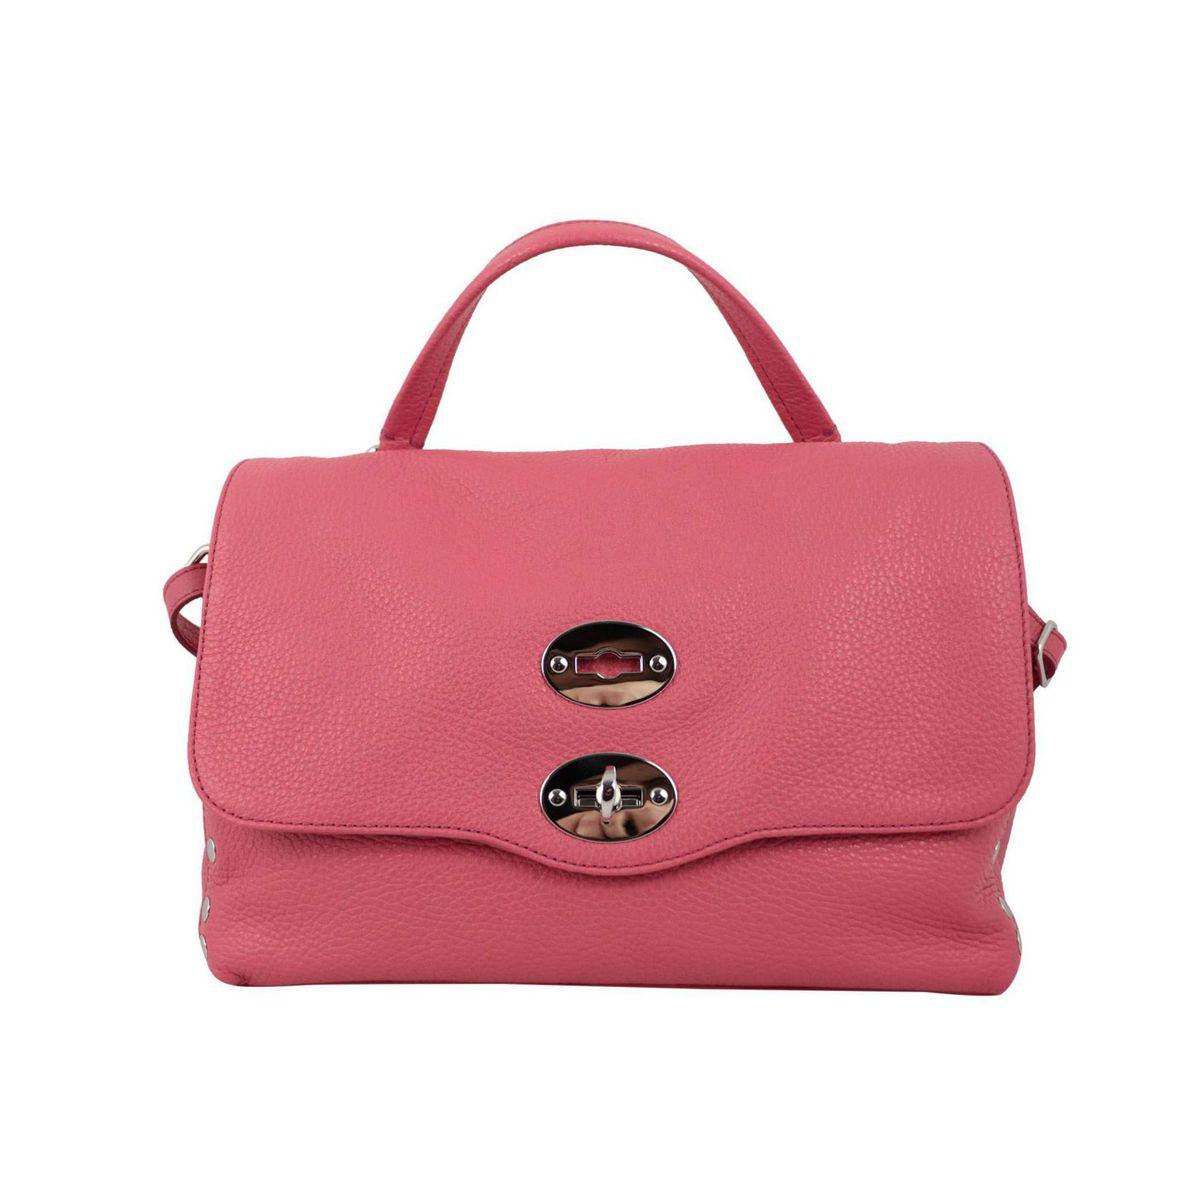 Postina S Daily bag in grained leather Rossana Zanellato